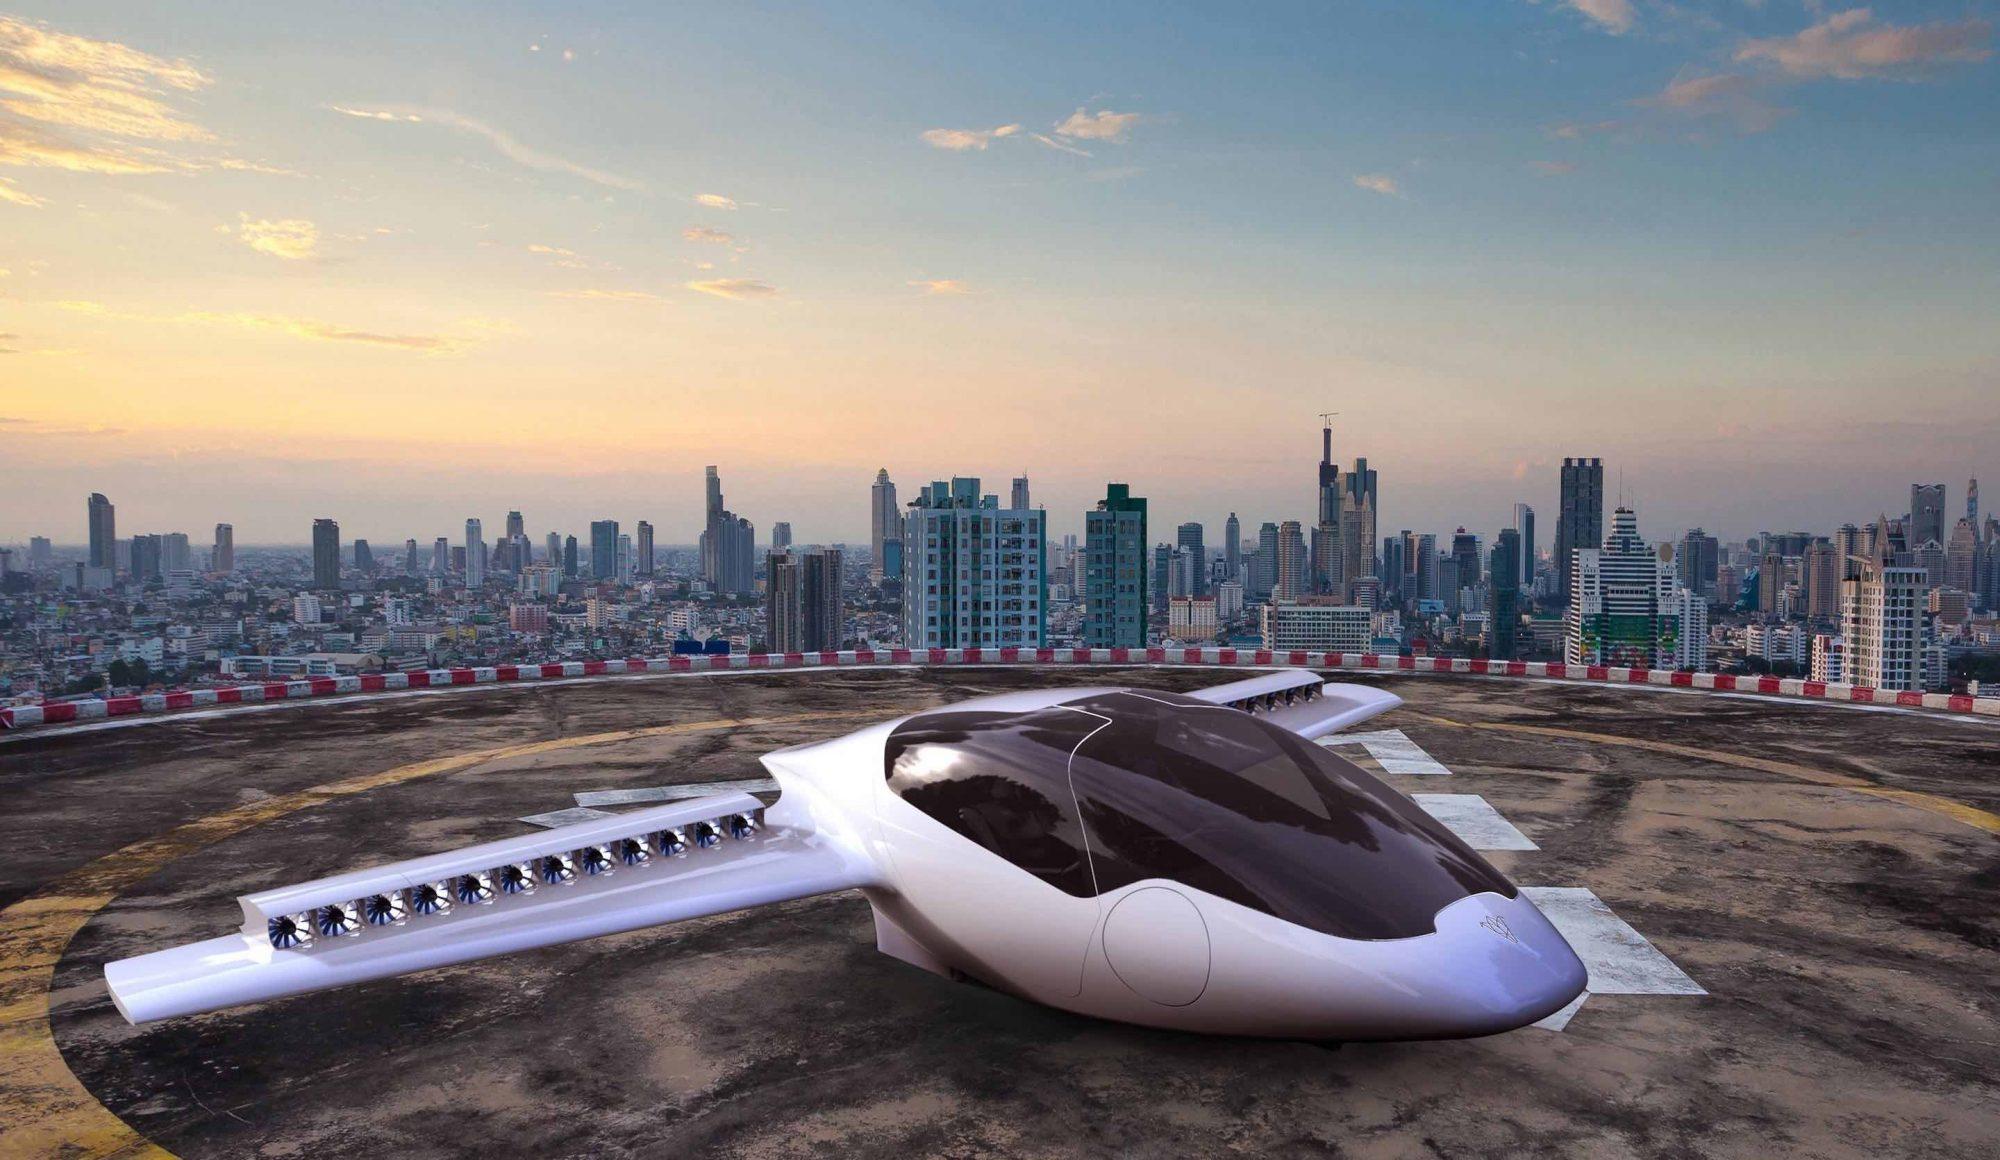 Une voiture volante futuriste attise les convoitises